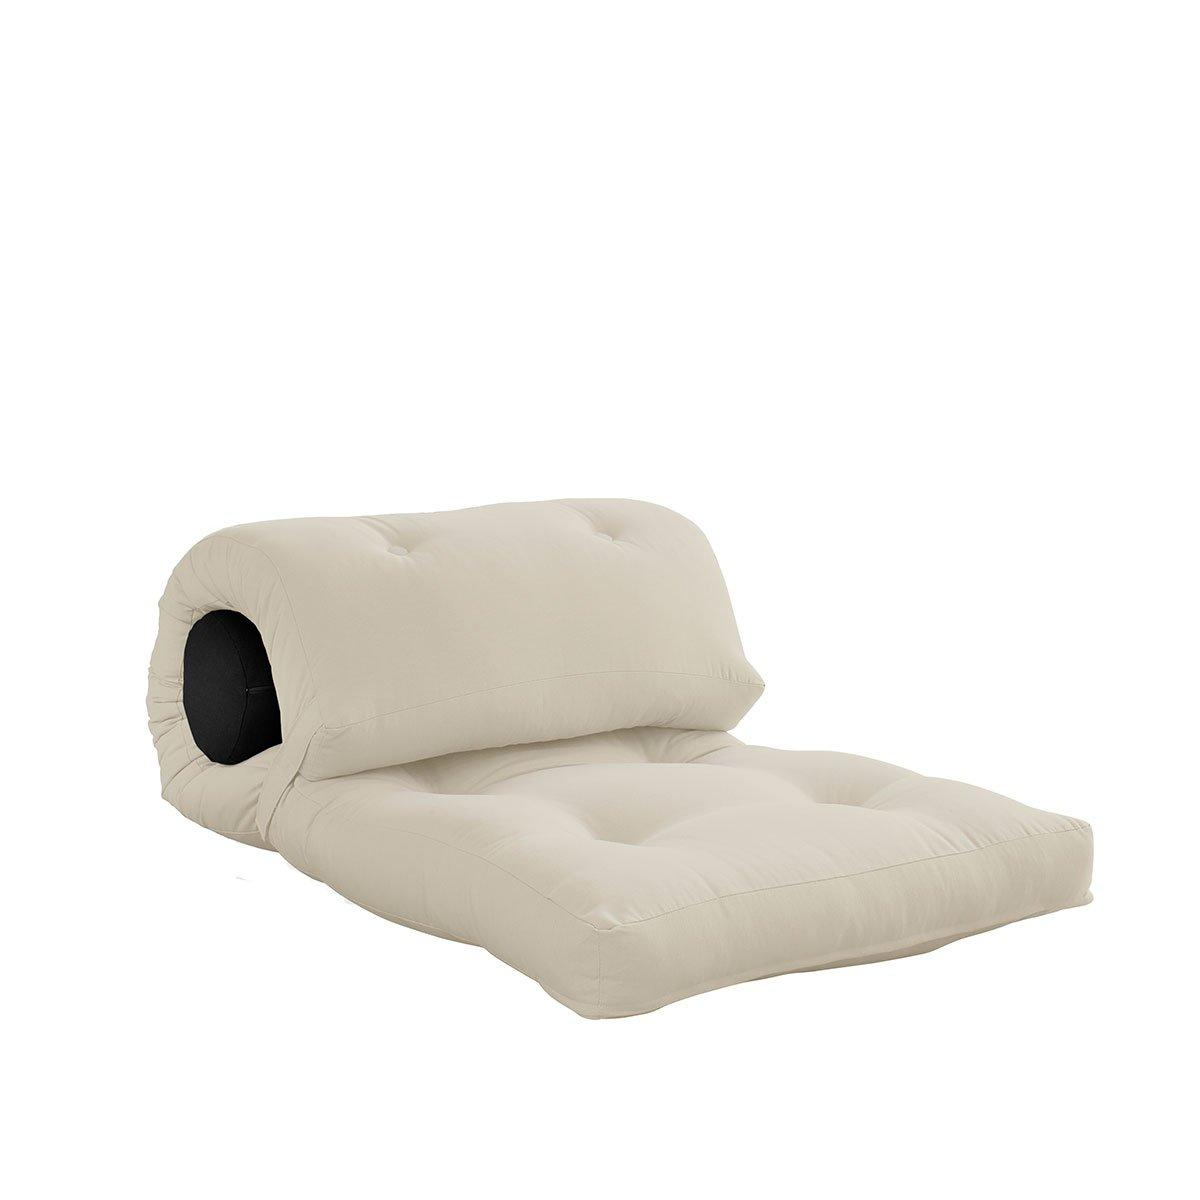 Variabilný matrac Wrap – Beige/Dark Grey